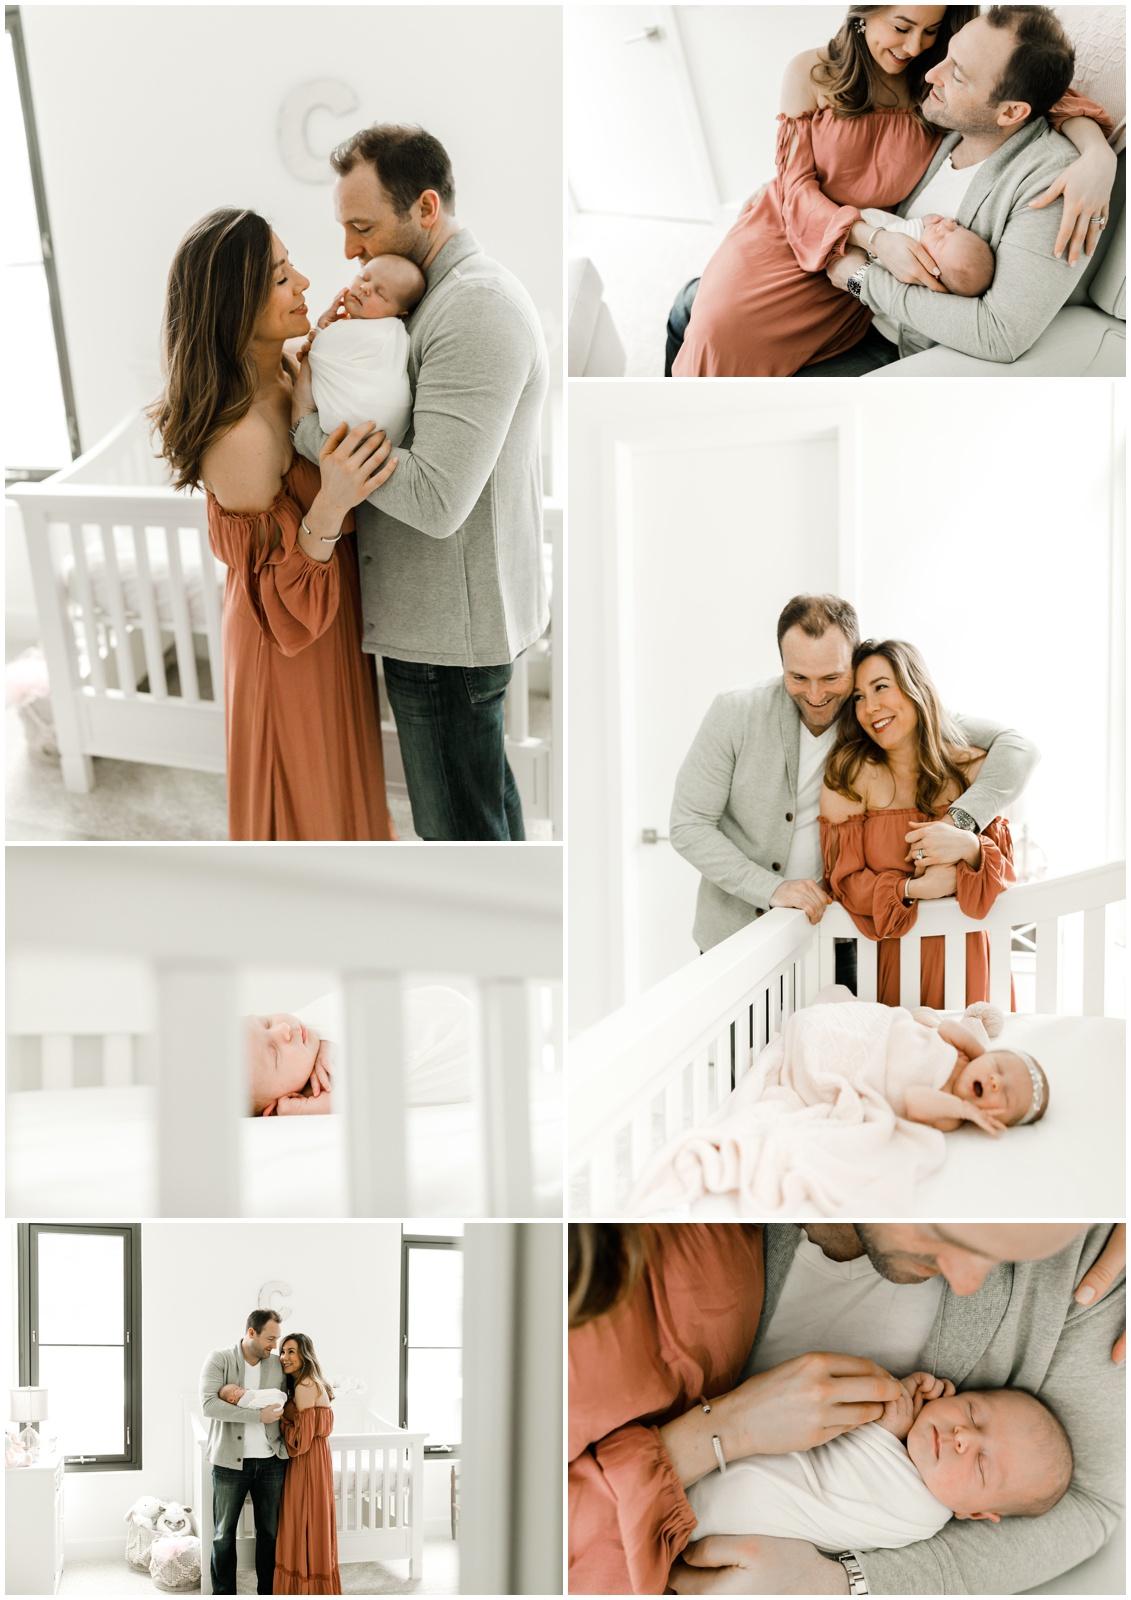 chicago-lifestyle-newborn-pregnancy-photographer-jenny-grimm-photography_0002.jpg